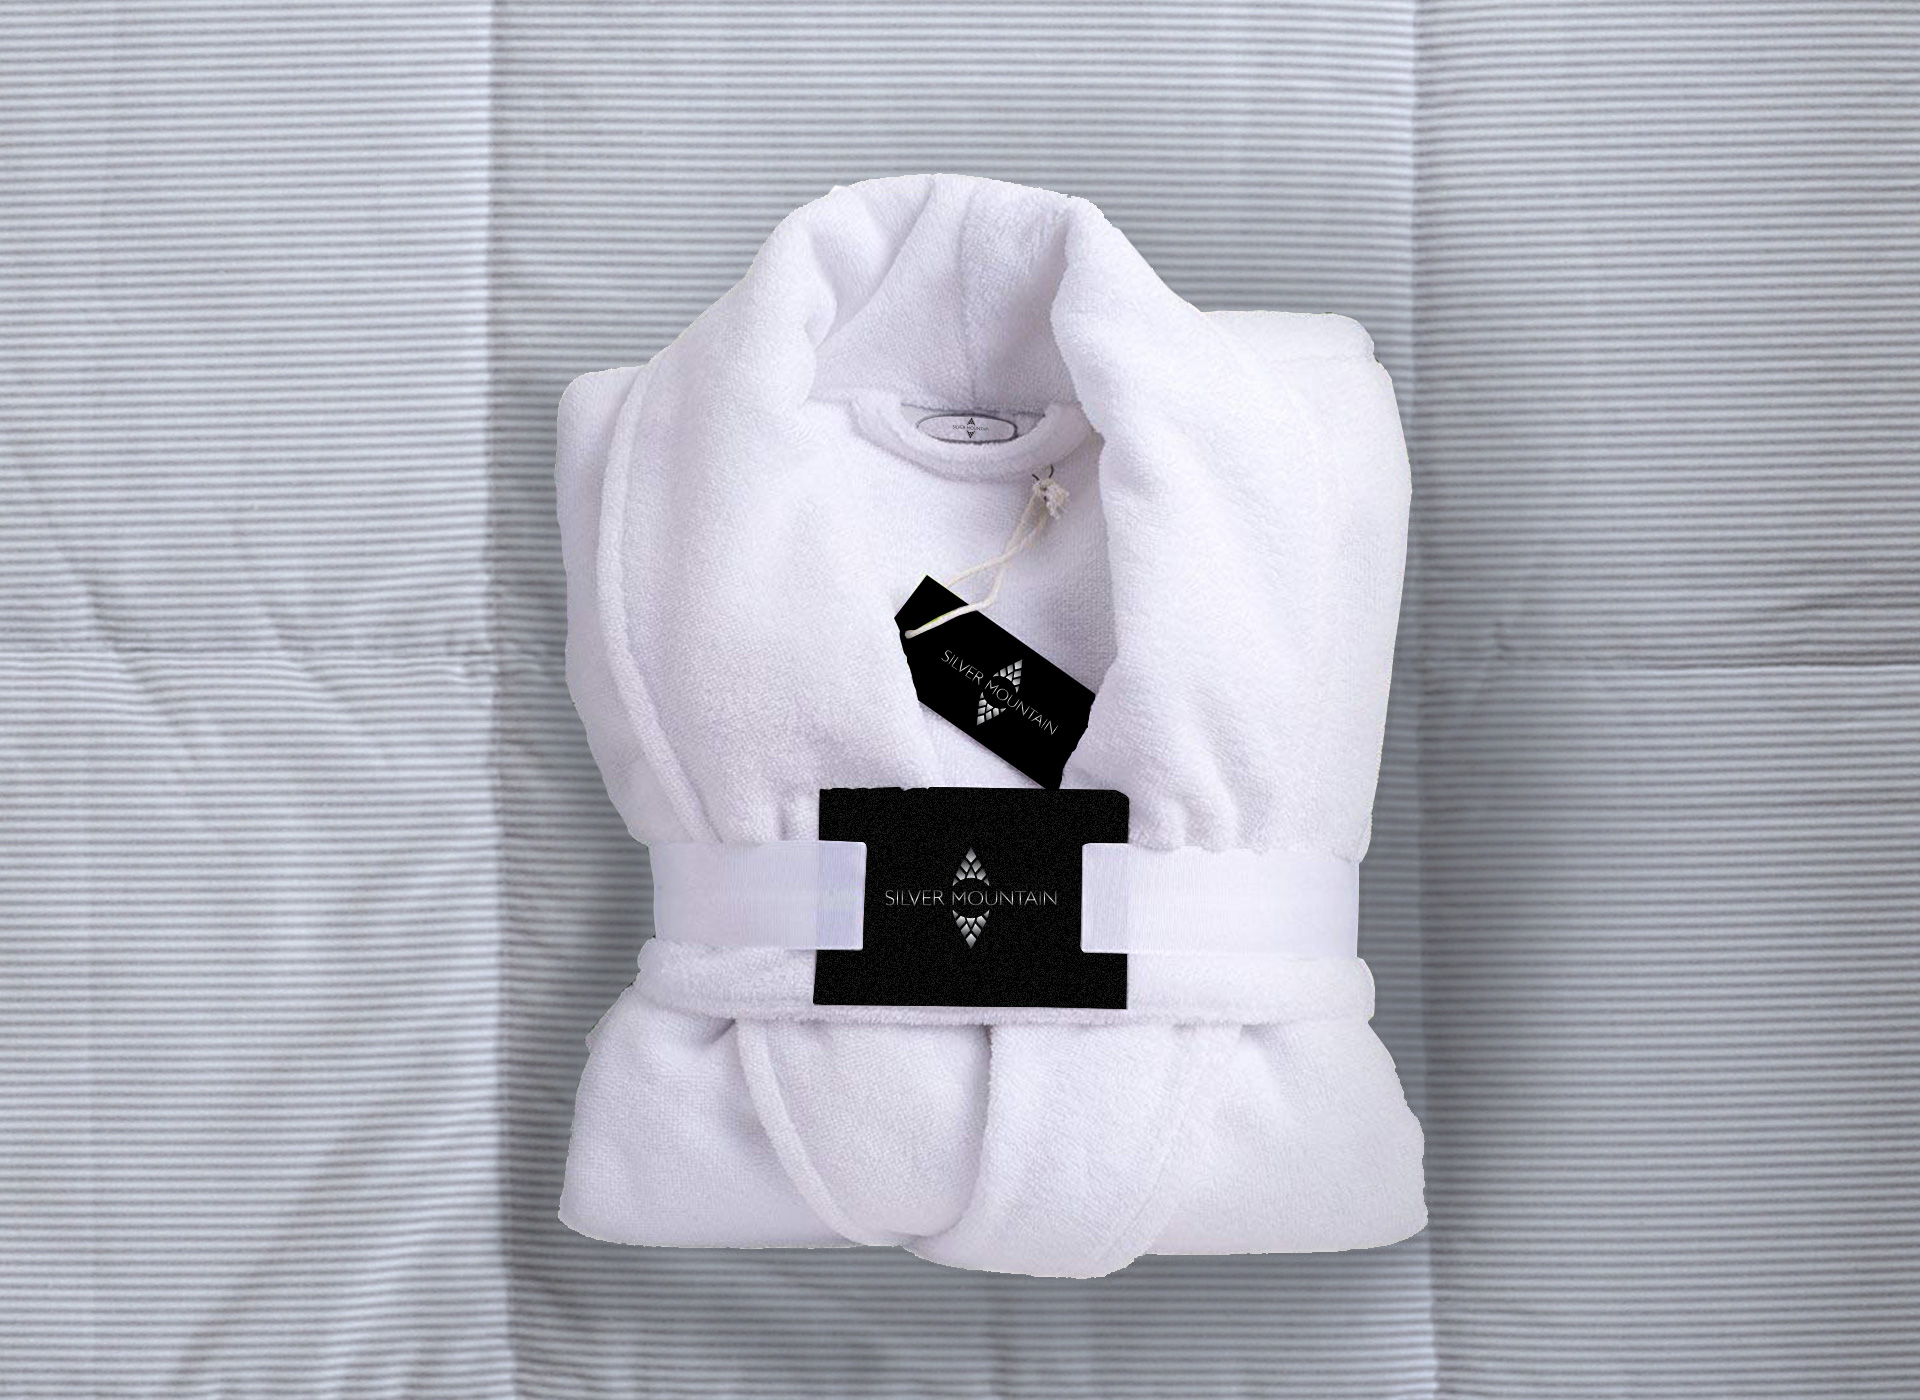 Silver Mountain portfolio inoveo bath robe